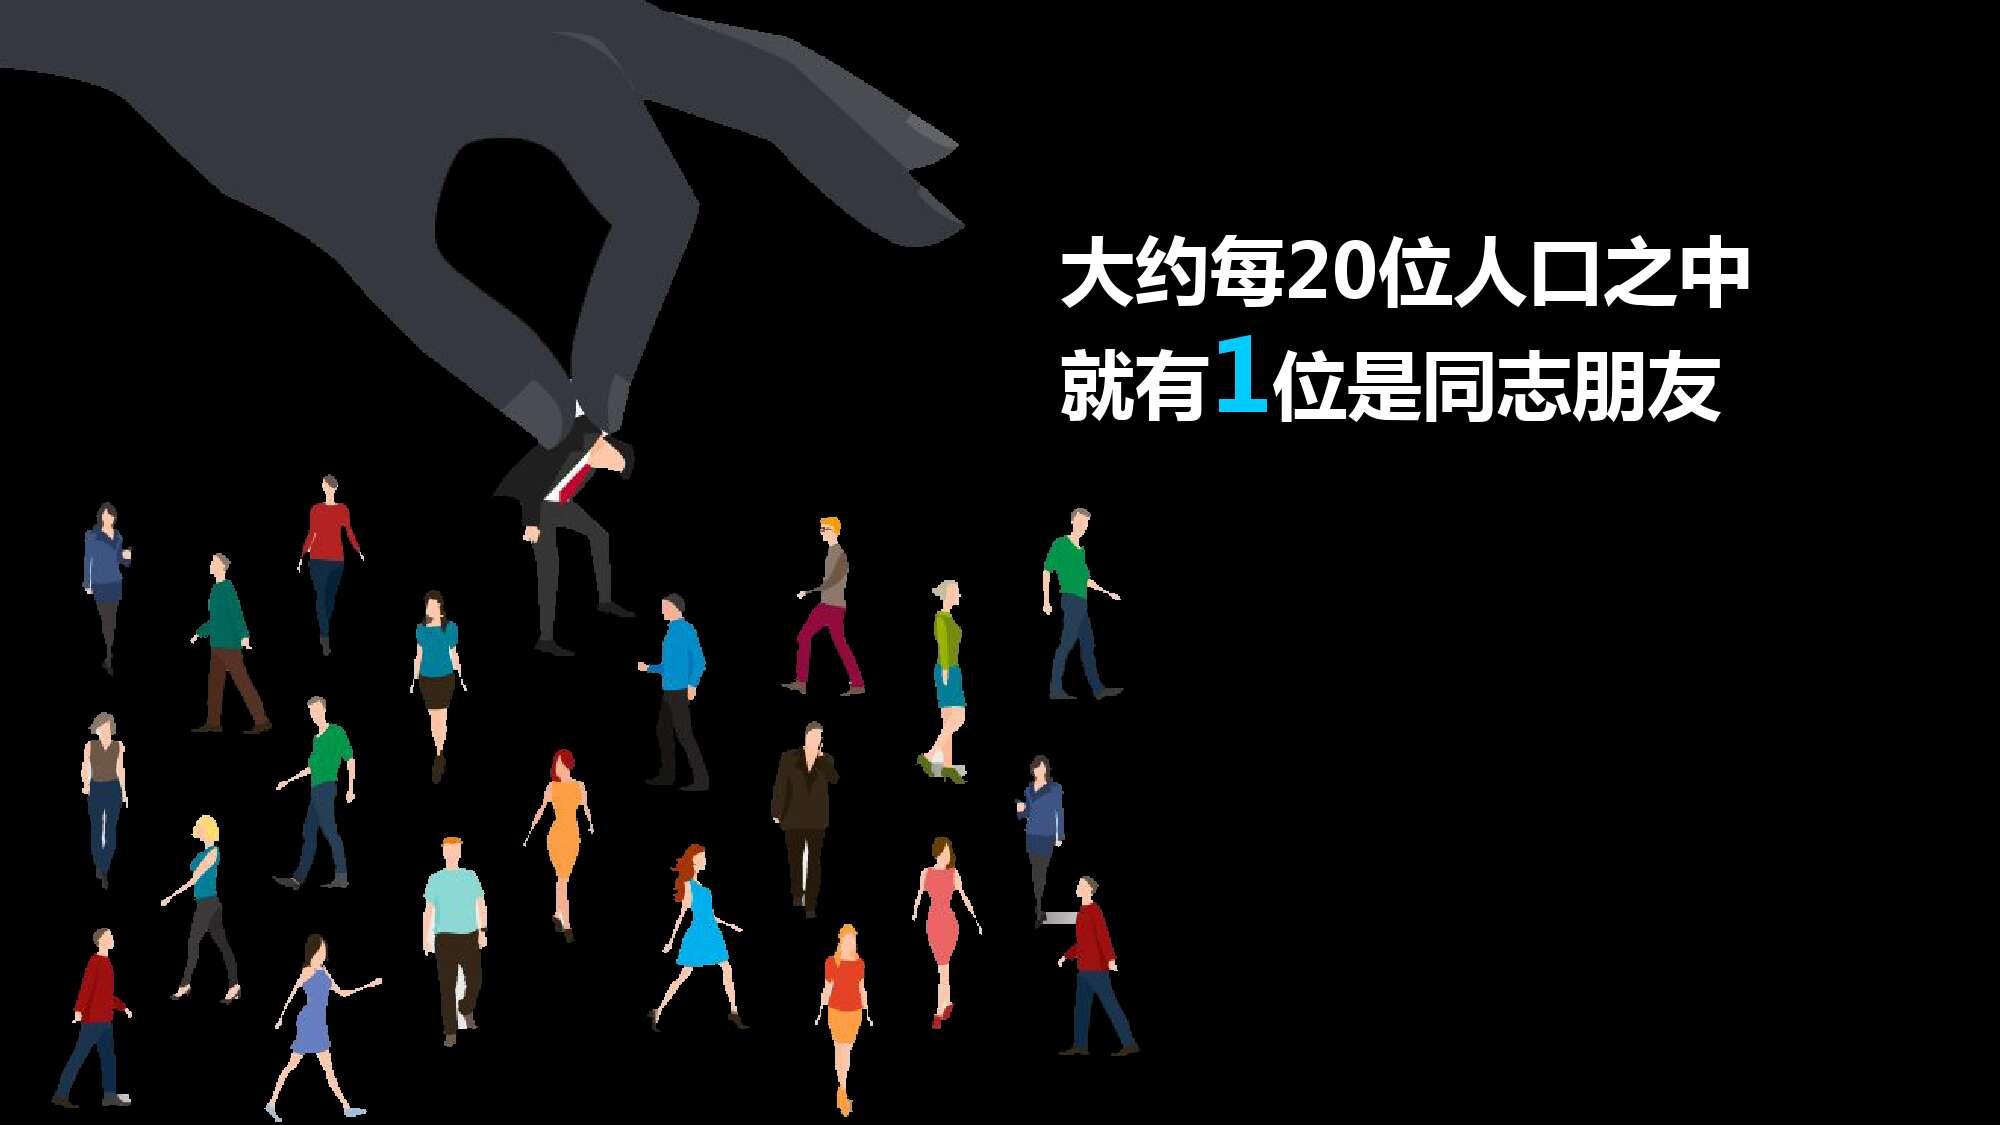 Blued2015中国同志社群大数据白皮书_000003